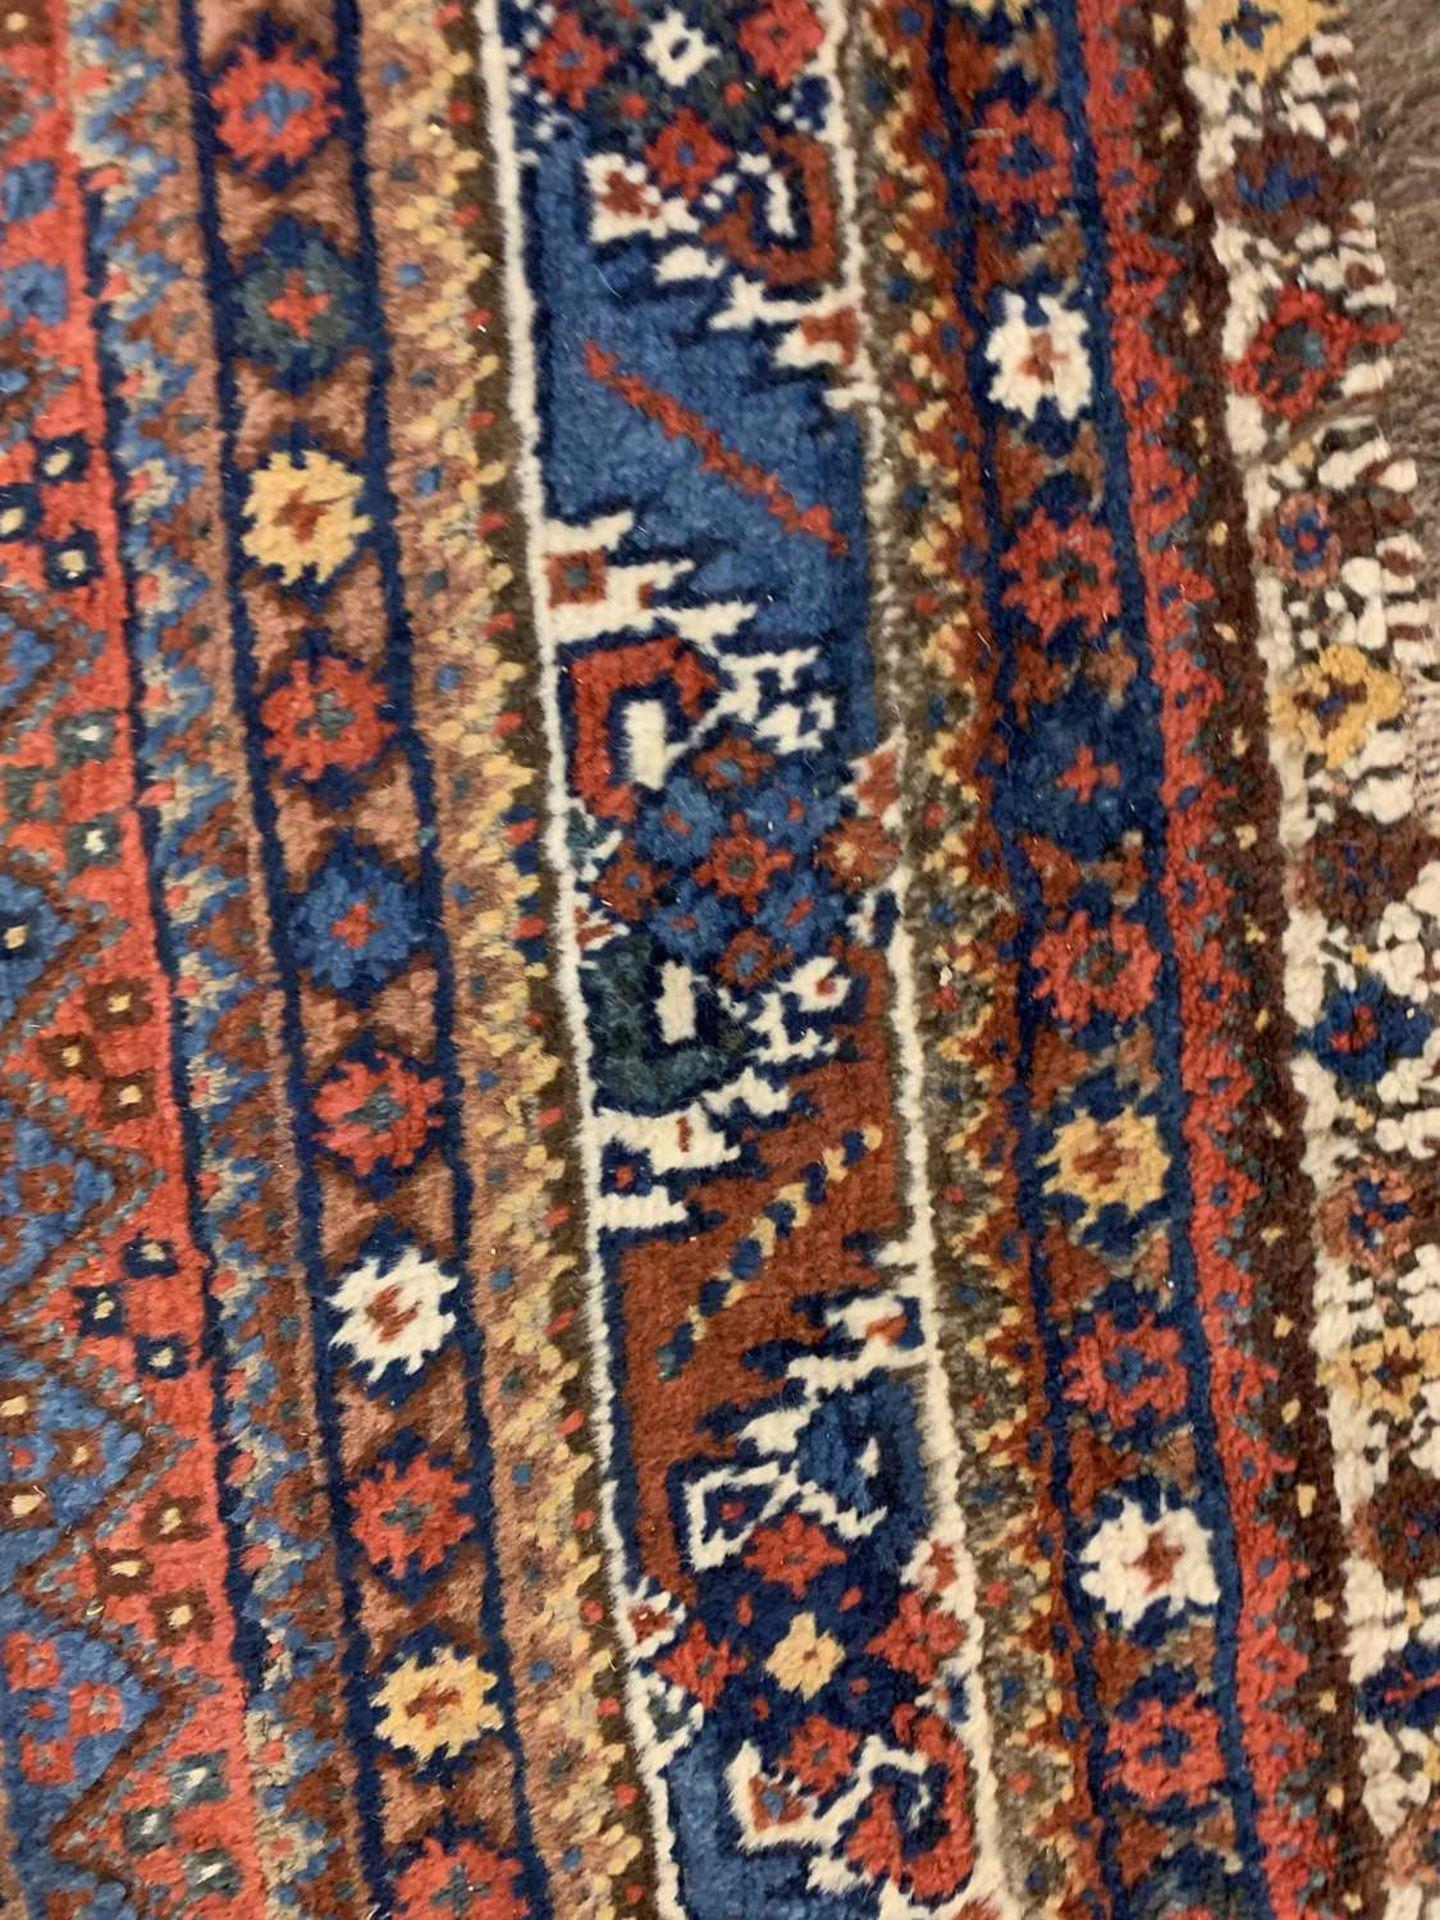 A South West Persian Khamseh carpet, - Image 3 of 17